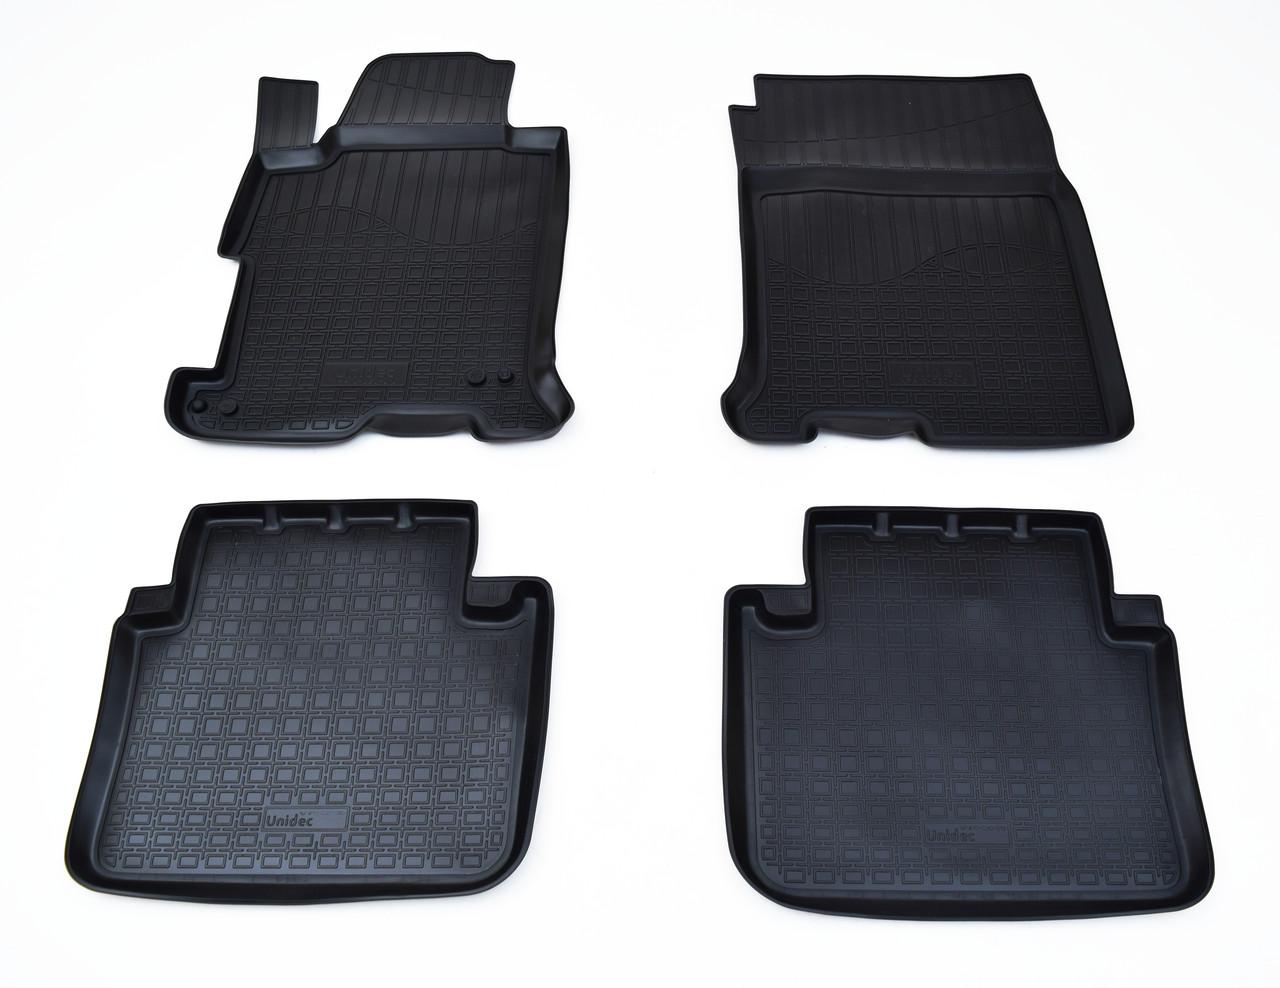 Килимки в салон для Honda Accord IX (13-) (полиур., компл - 4шт) NPA10-C30-010